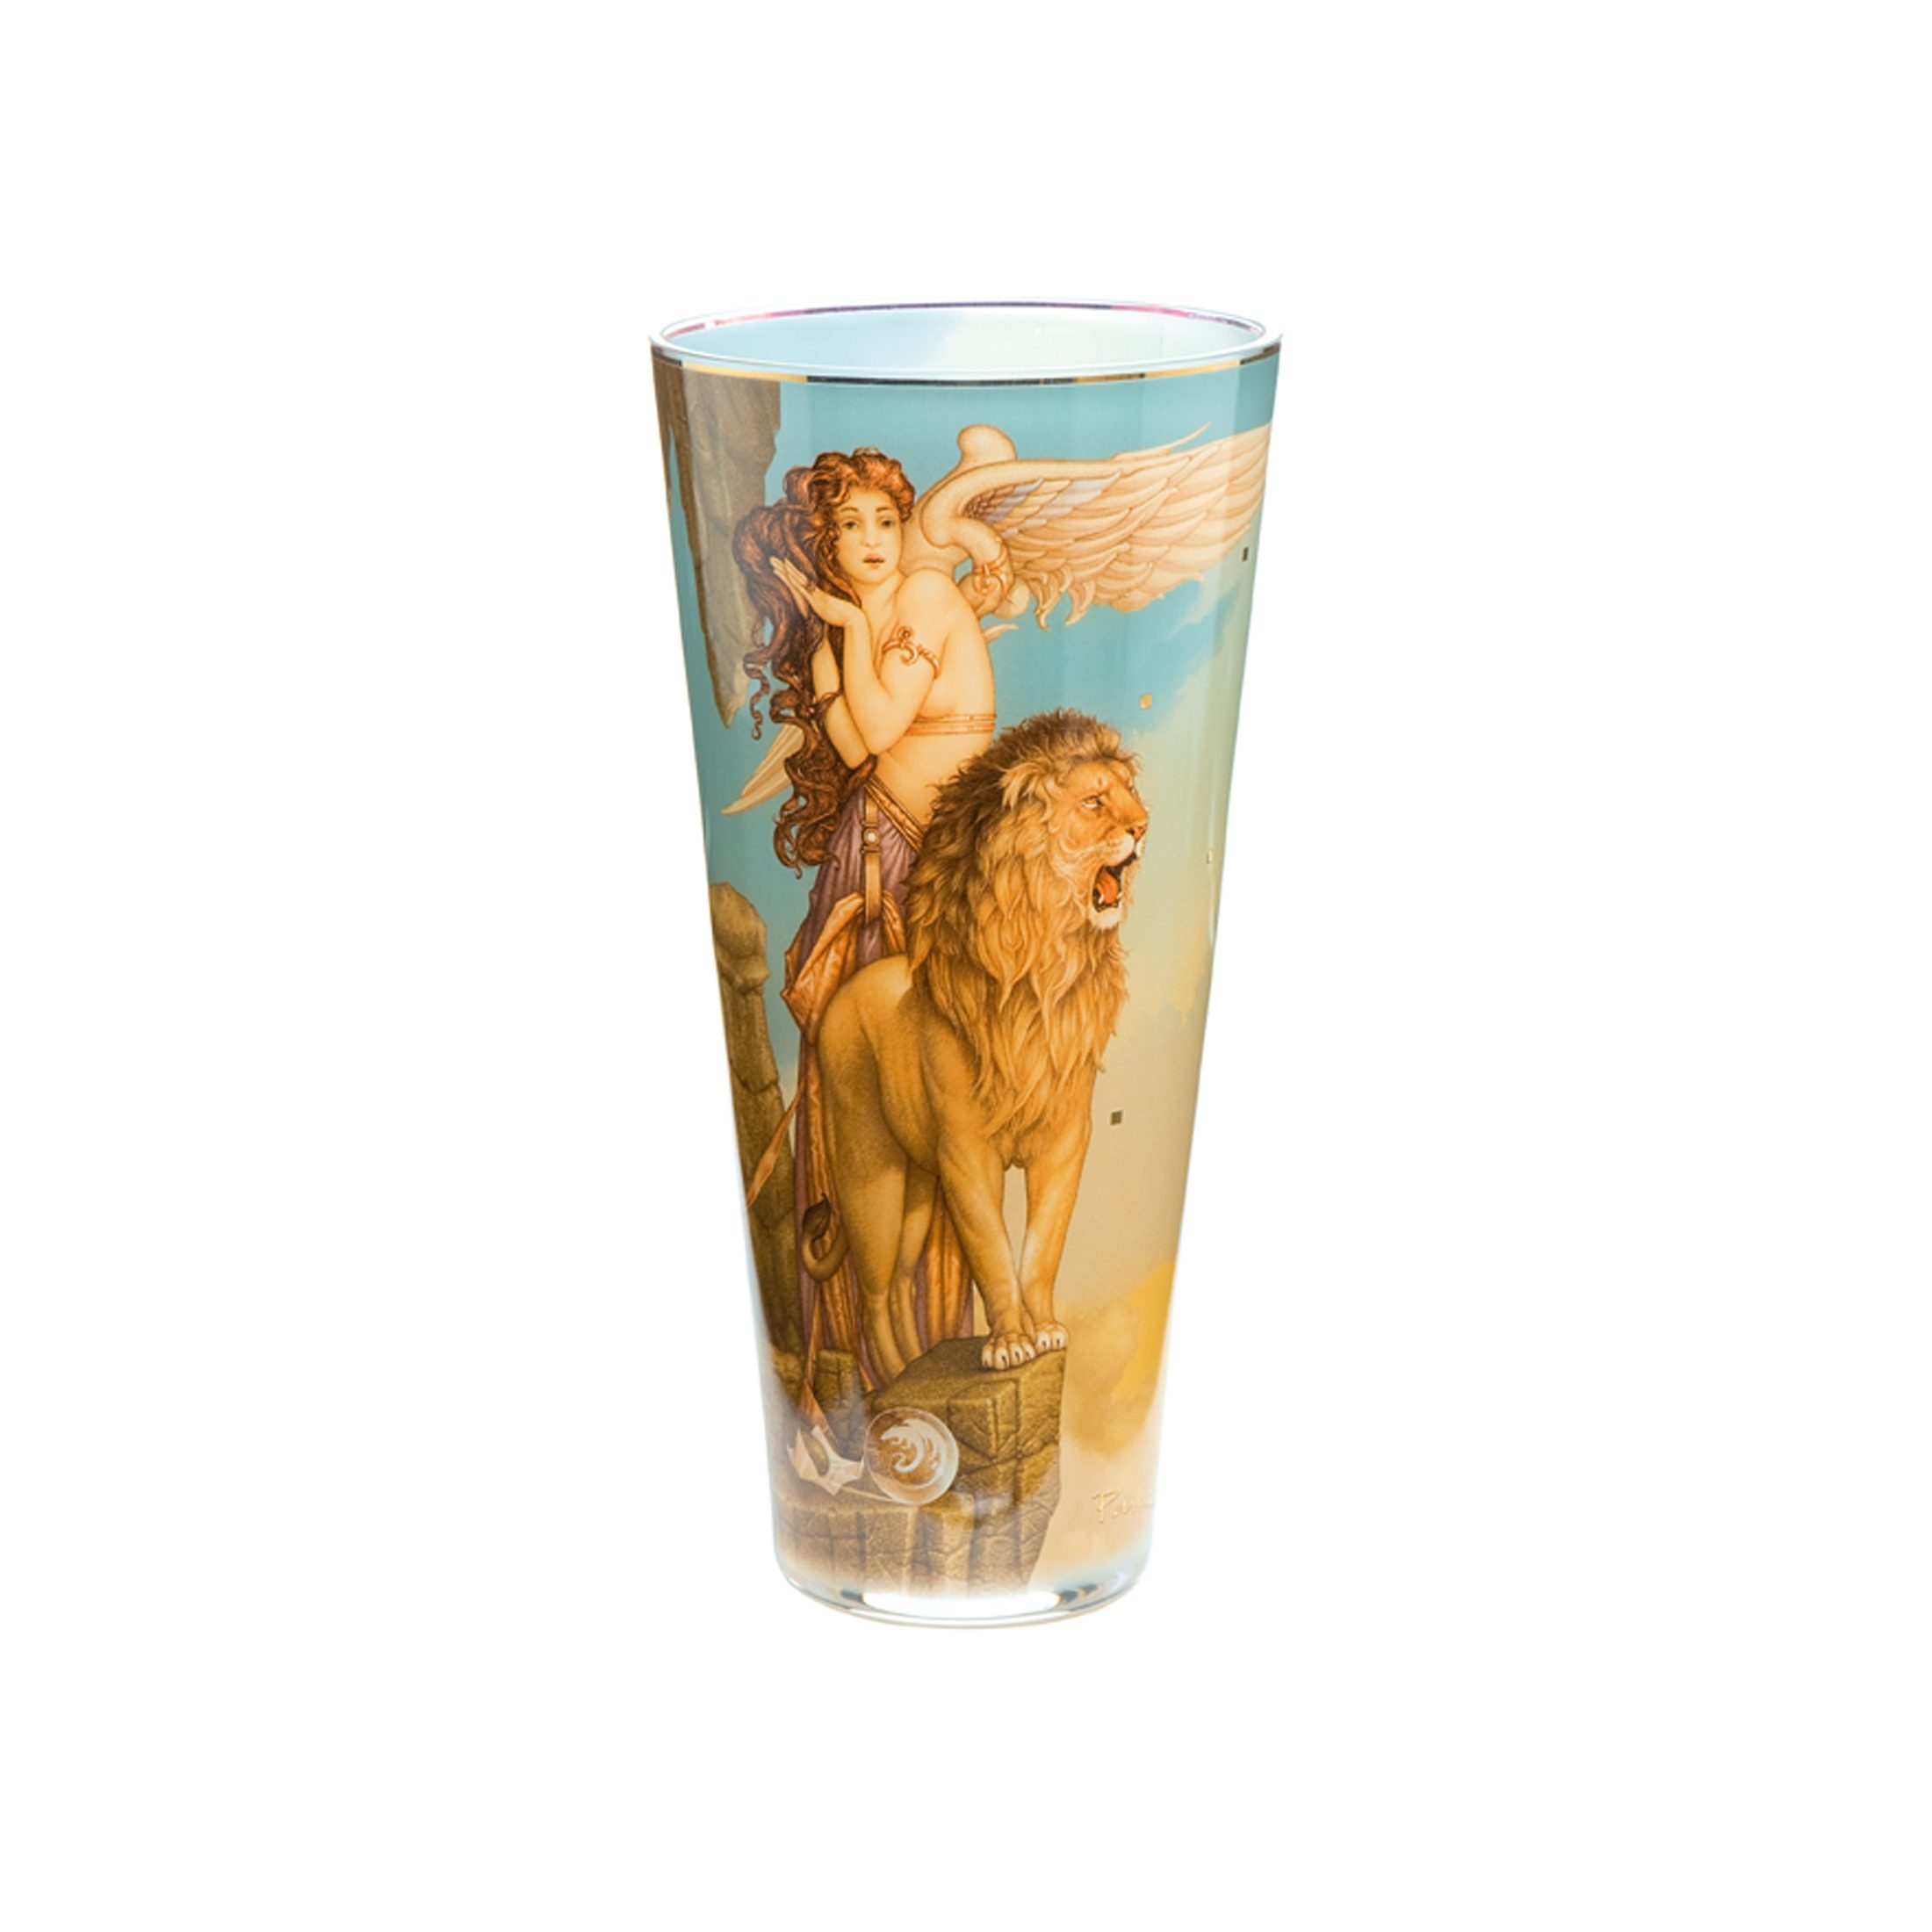 Goebel Lions Return Vase »Artis Orbis«